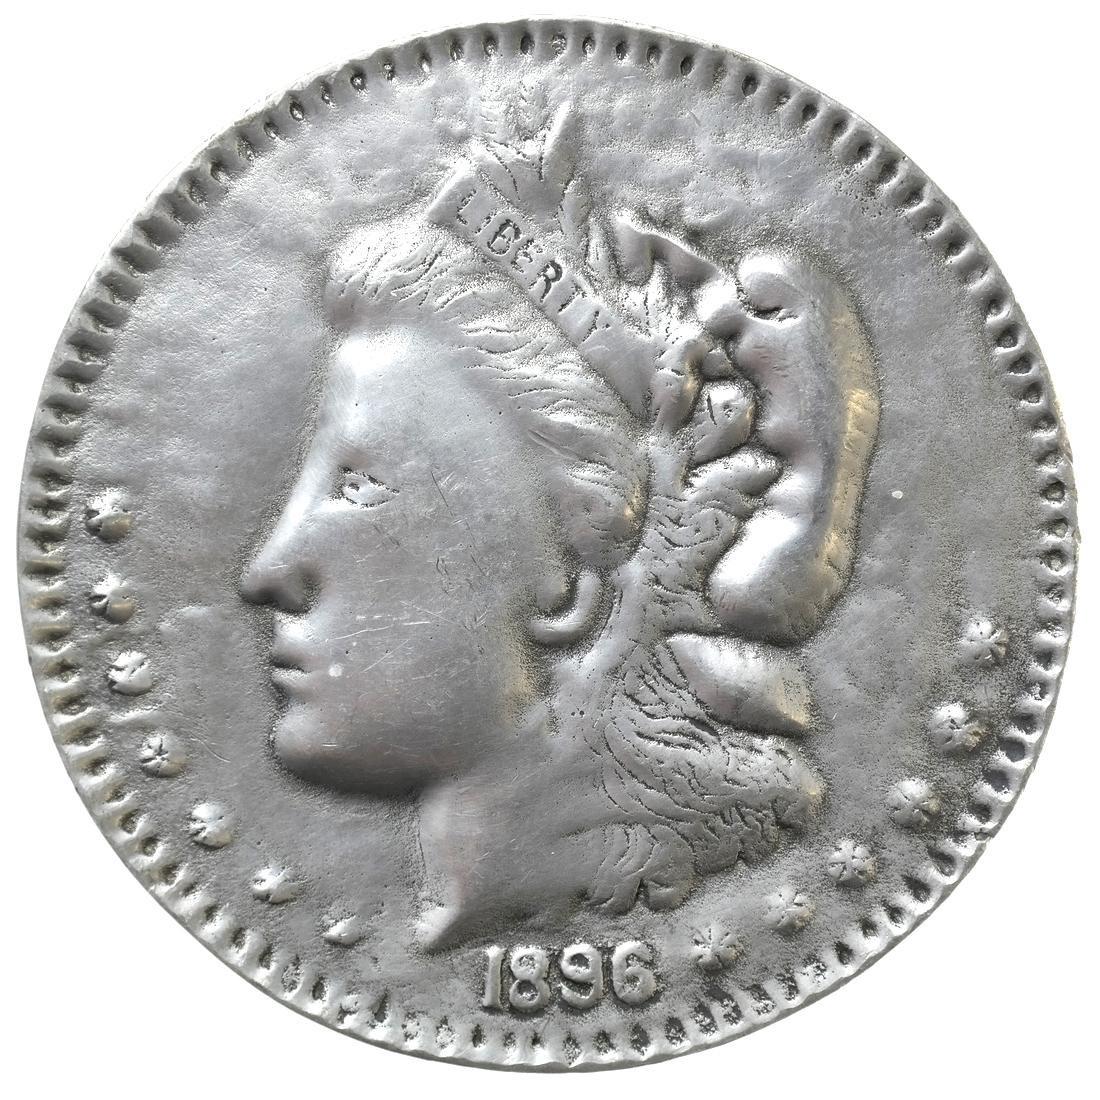 LIBERTY HEAD DOLLAR, 1896.